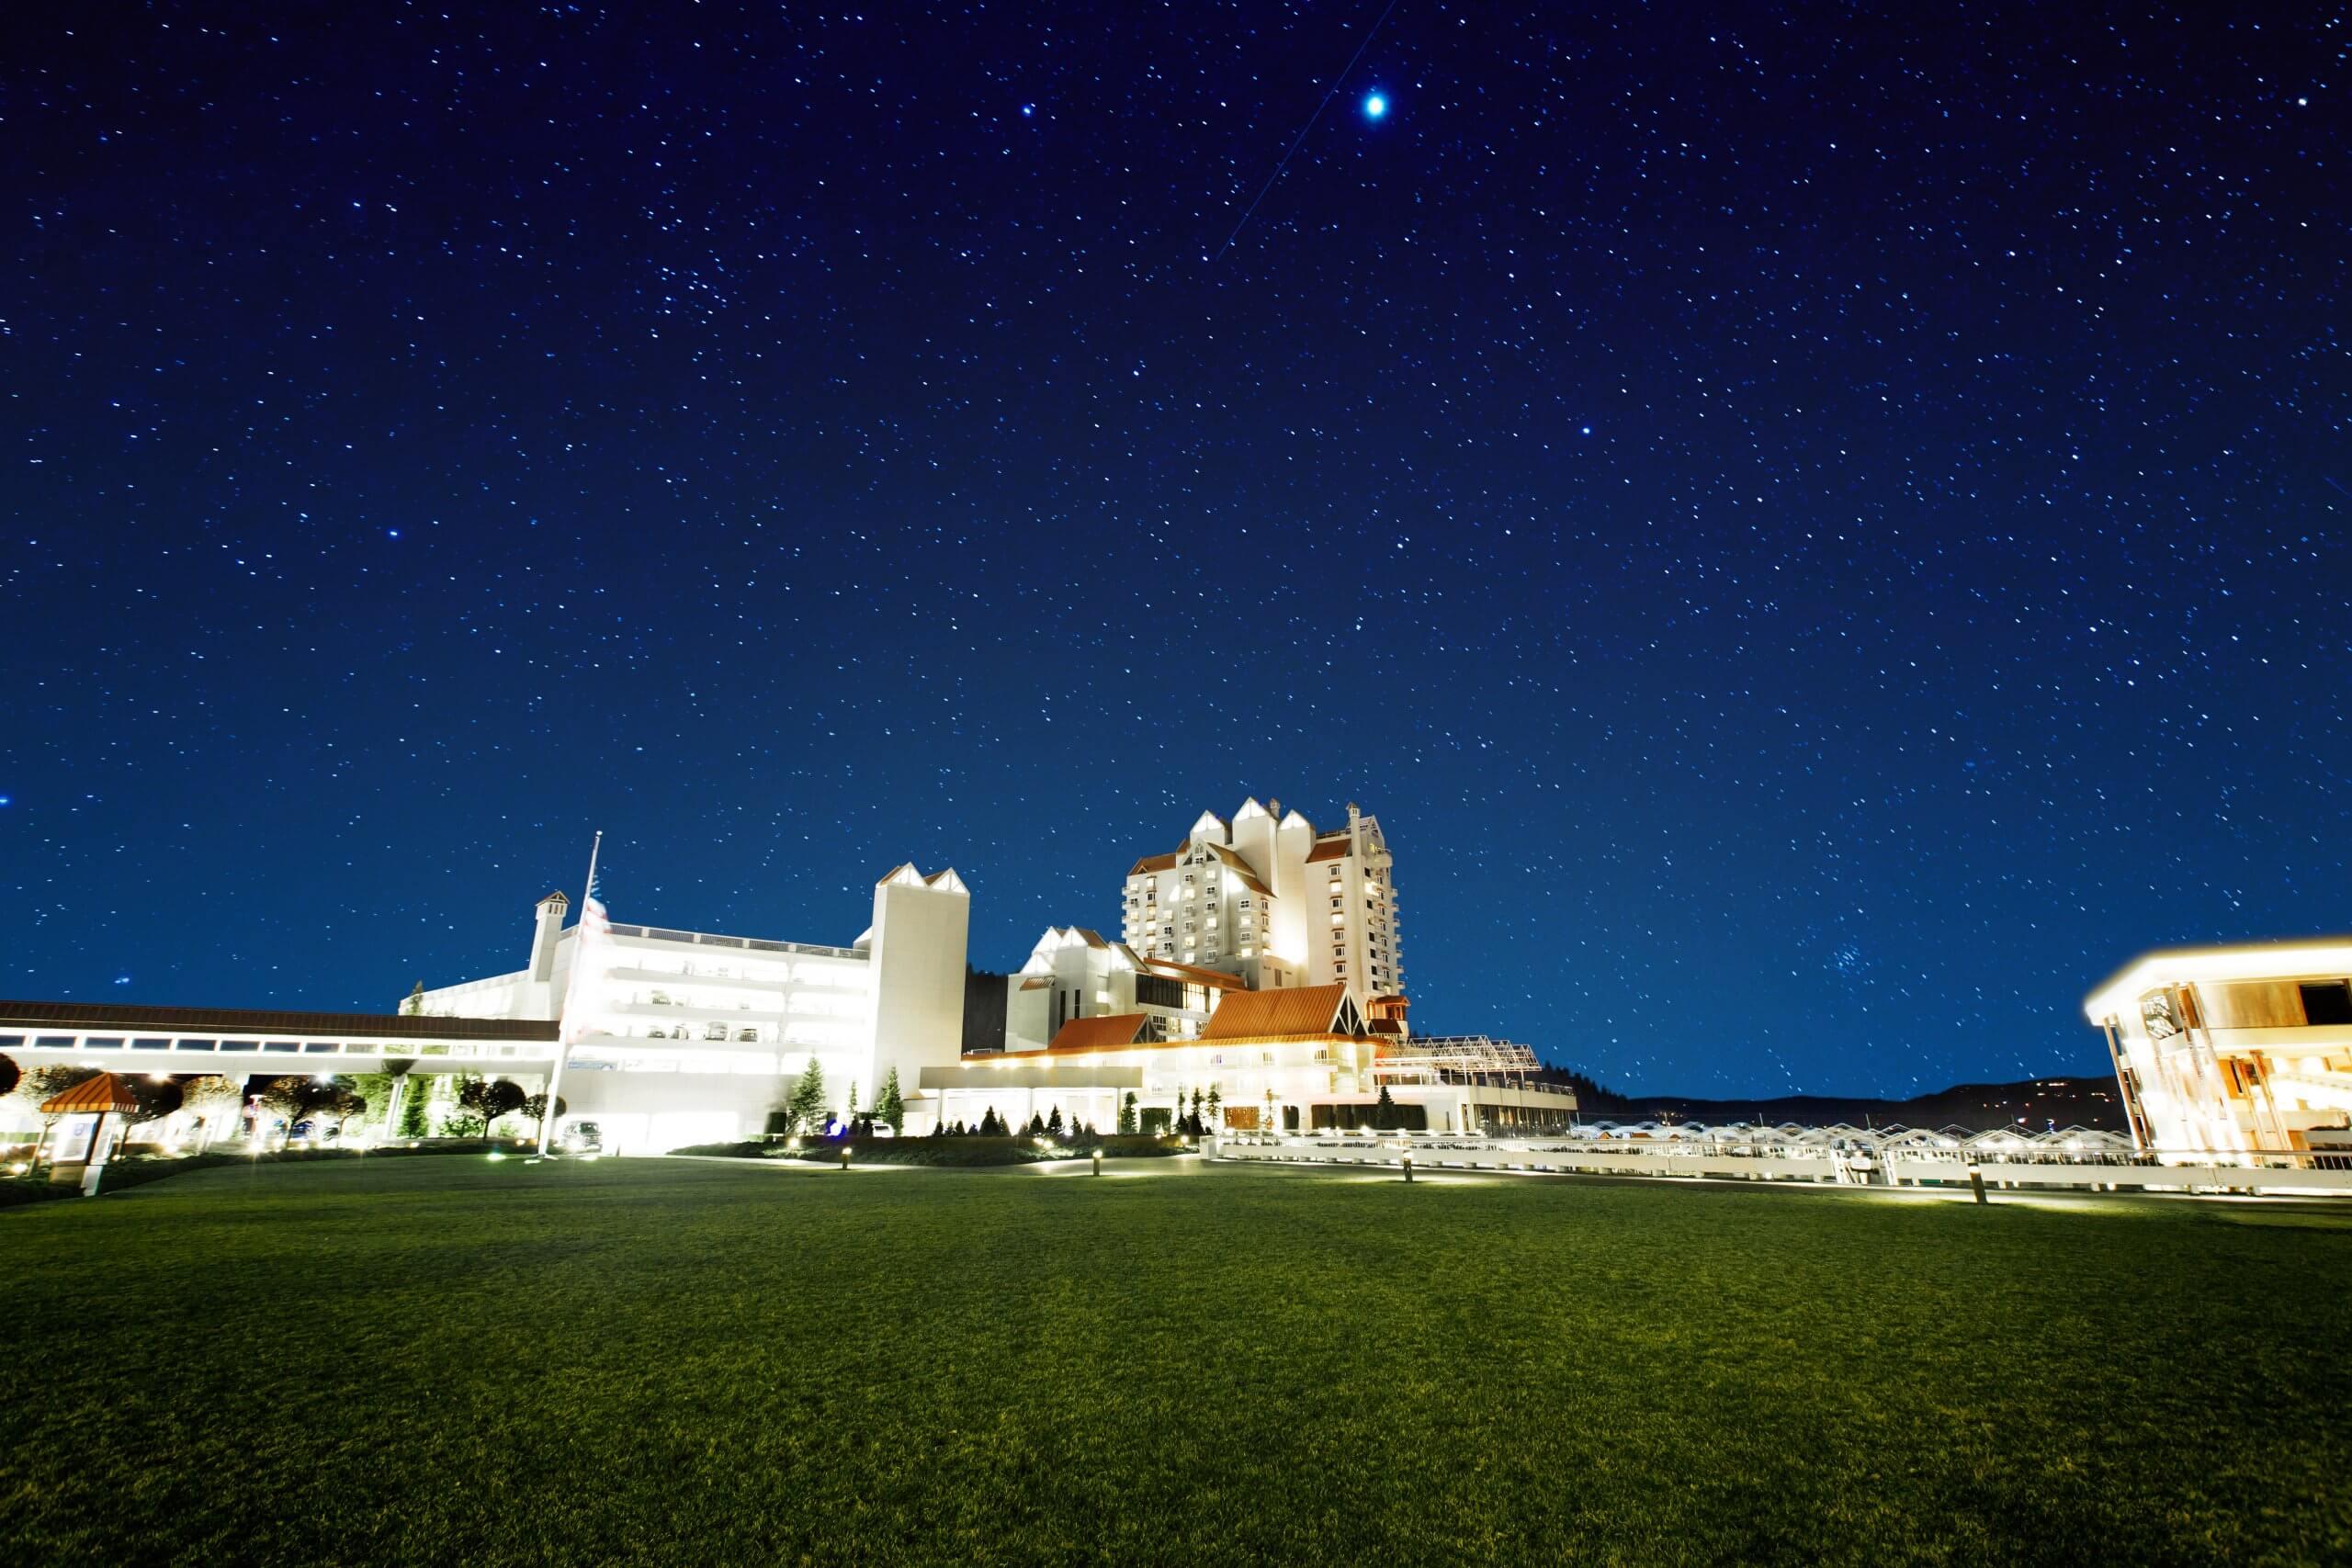 Night Sky, The Coeur d'Alene Resort, Coeur d'Alene. Photo Credit: Idaho Tourism